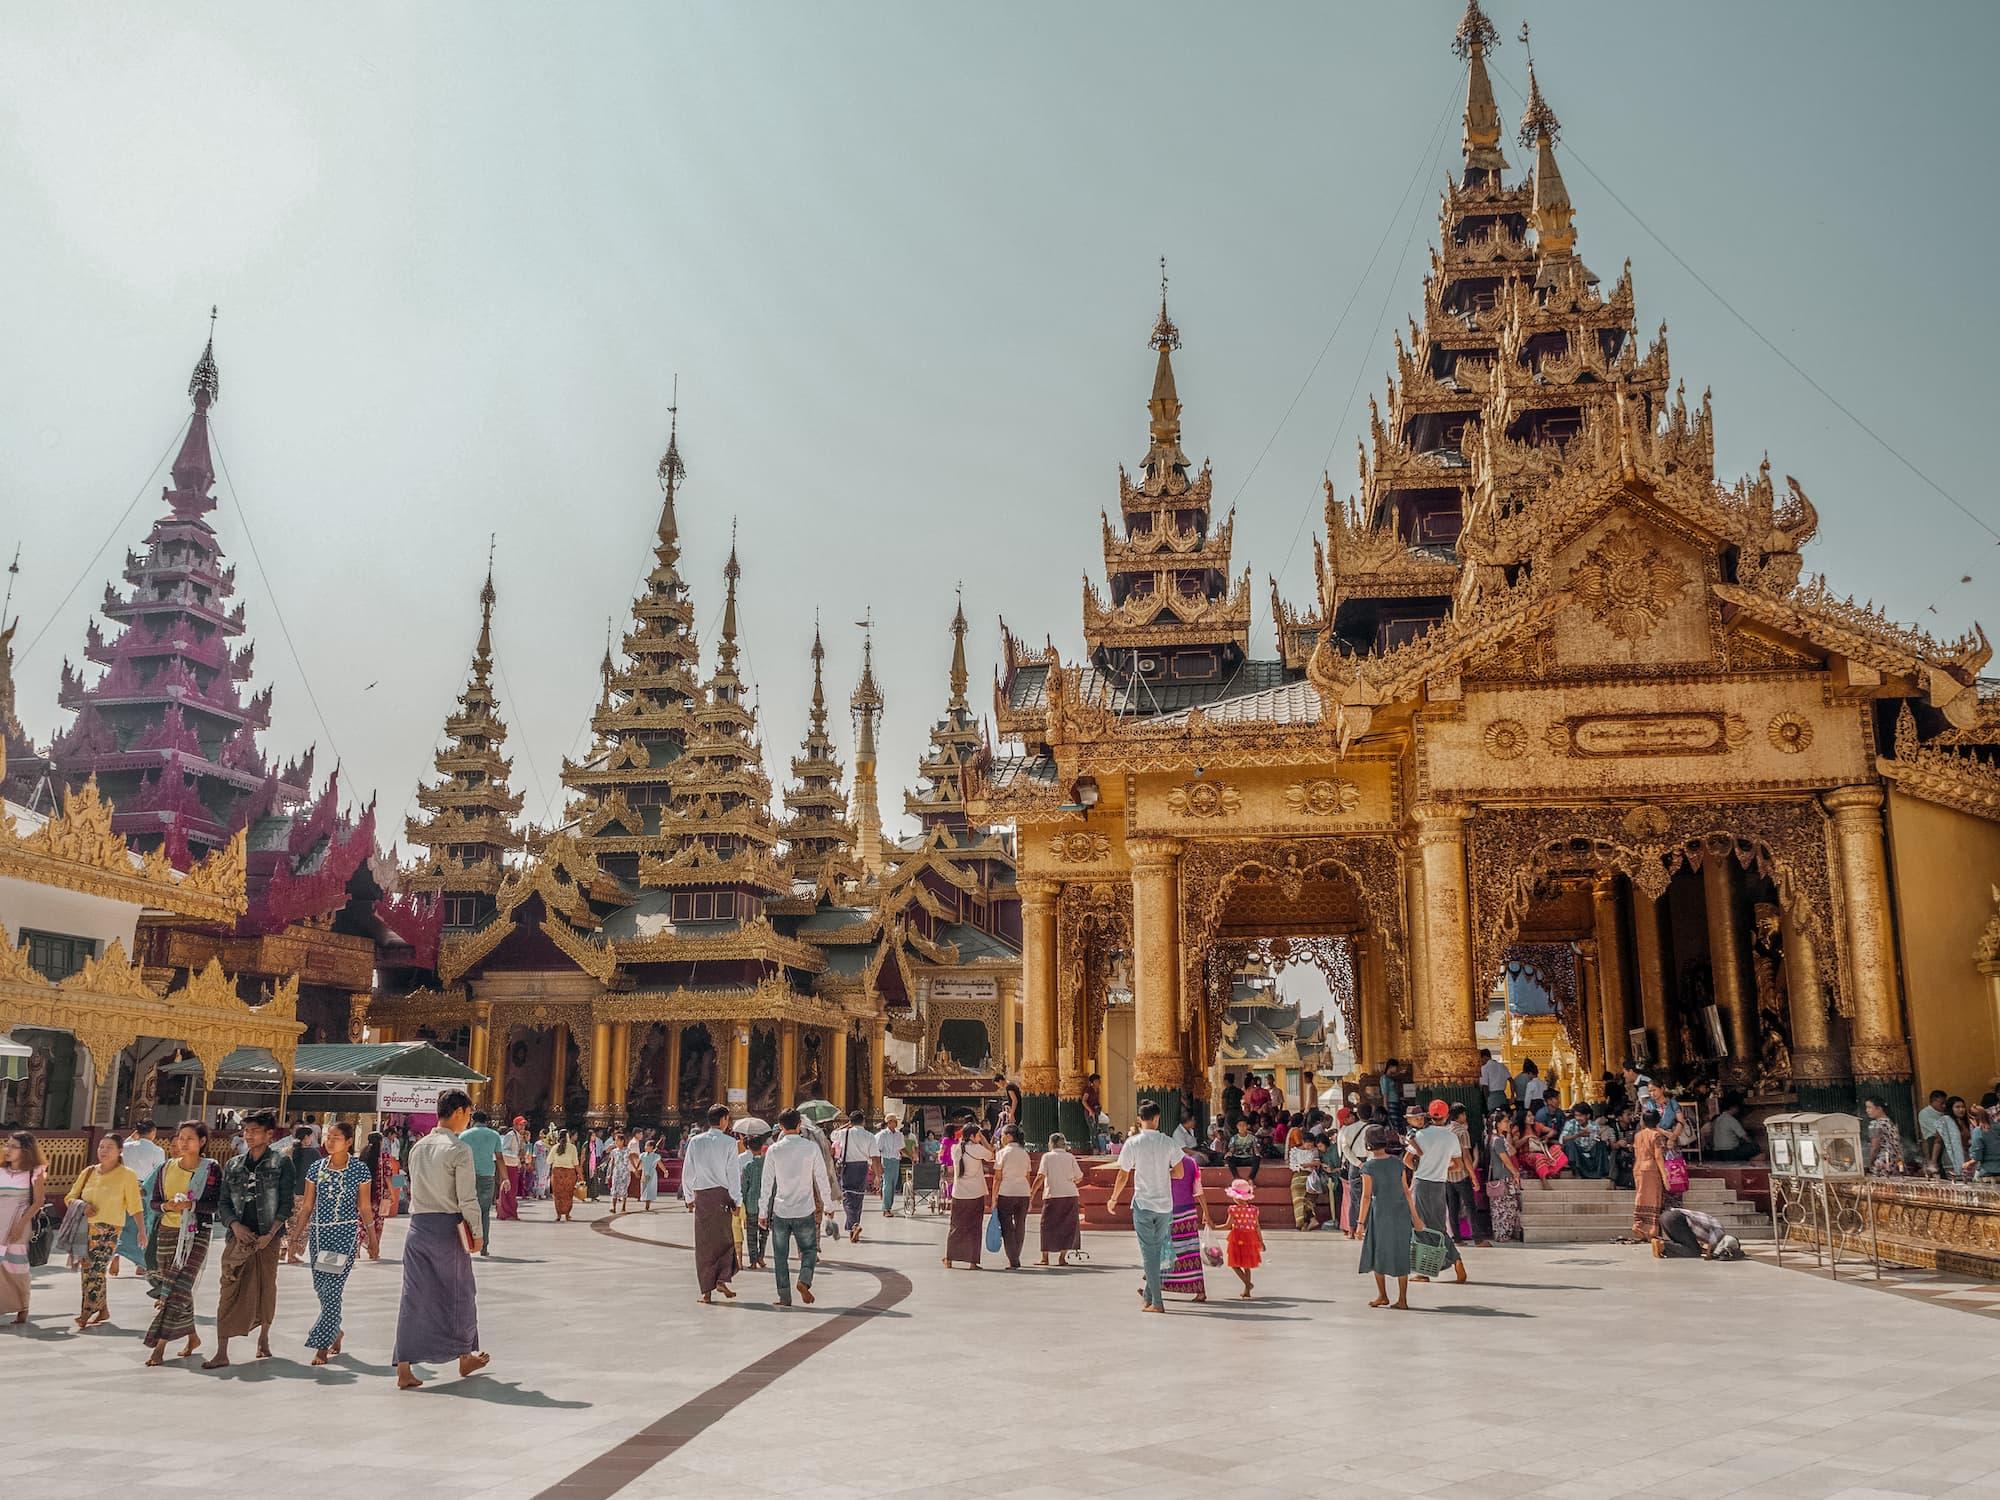 Myanmar Reisetipps und Infos shwedagon pagoda yangon